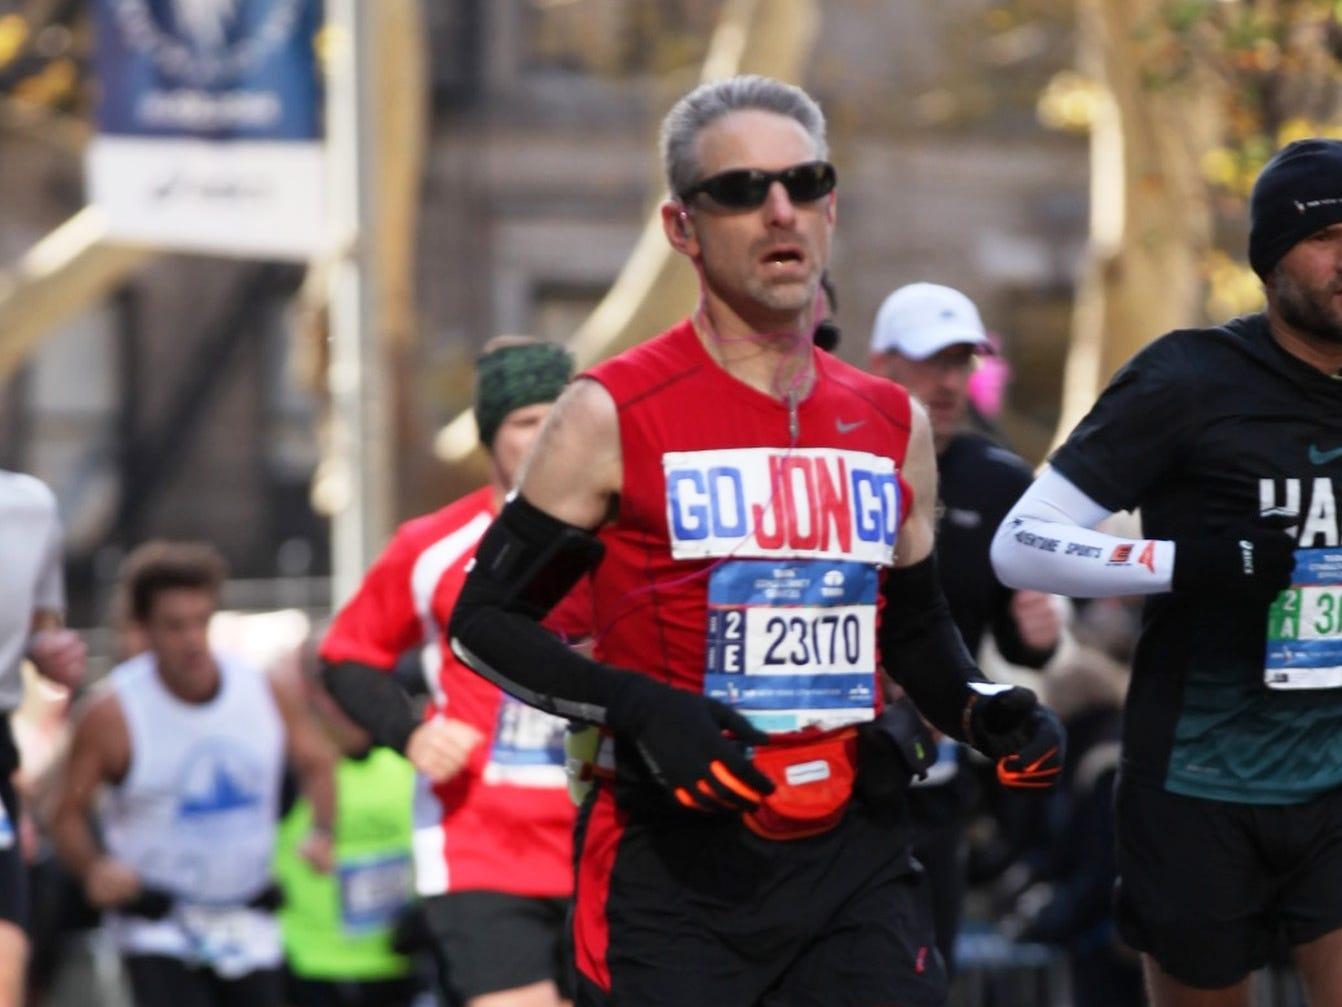 Jonathan Goldberg.